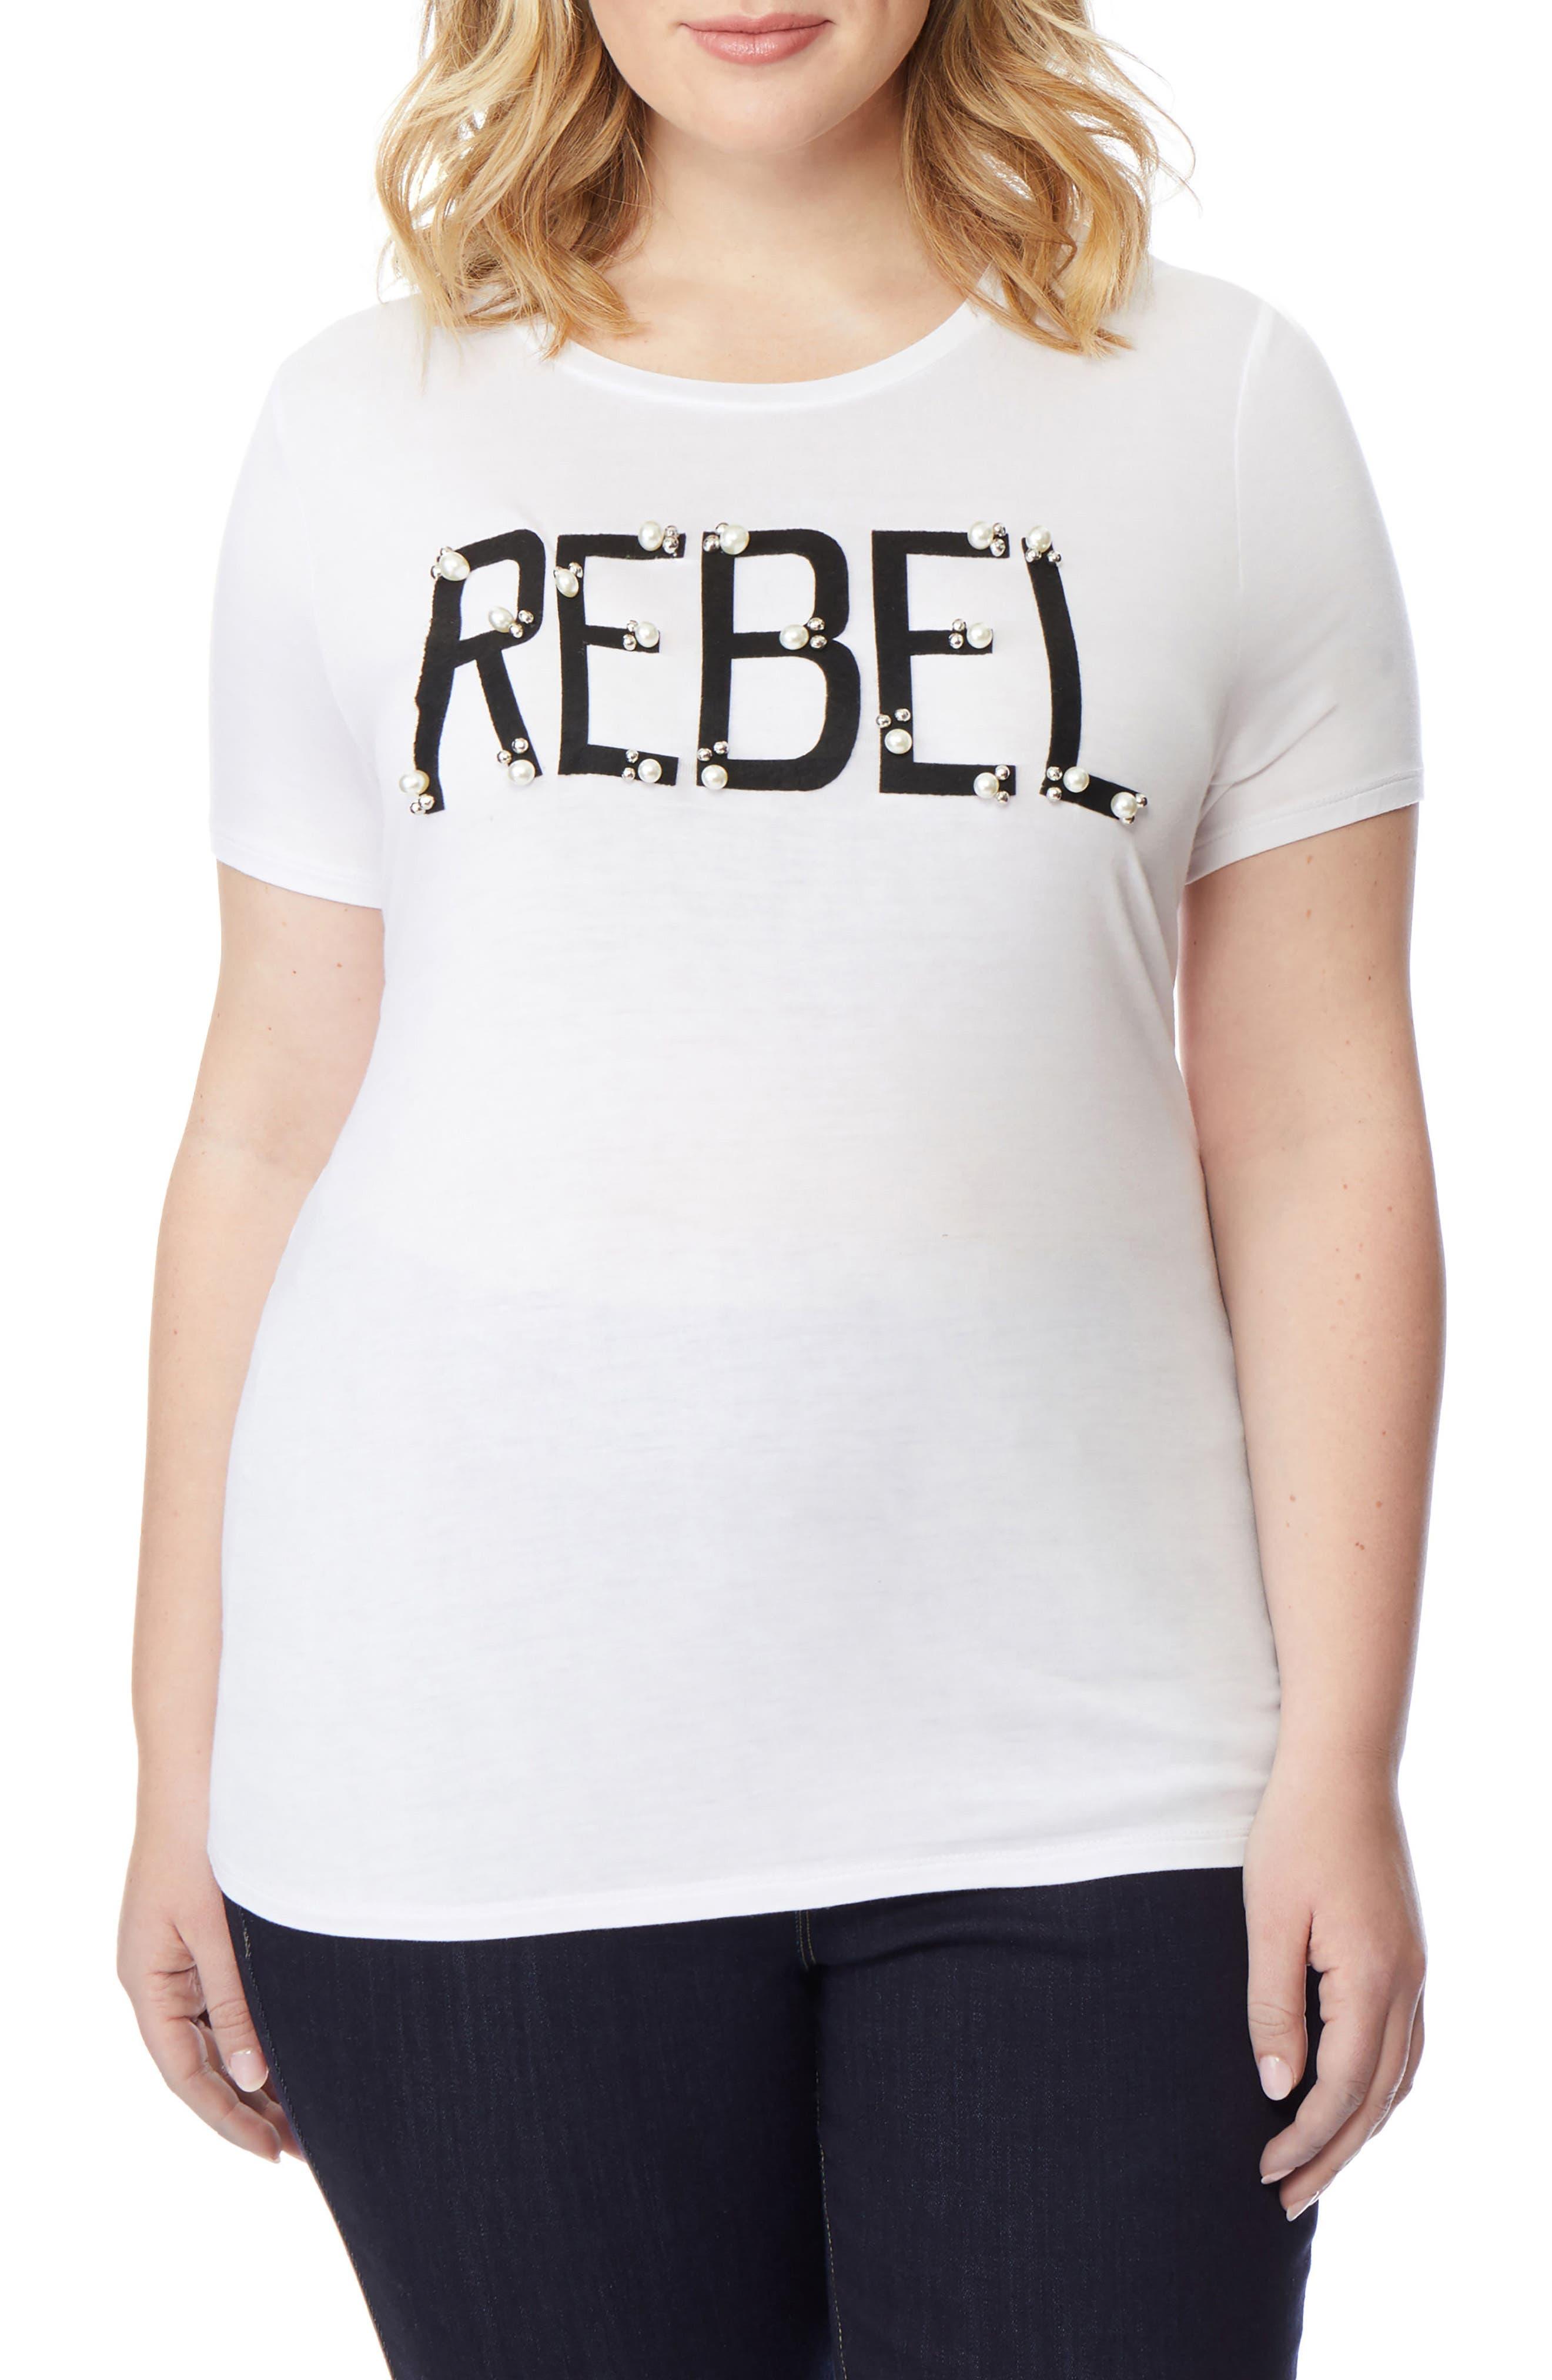 Rebel Embellished Graphic Tee,                         Main,                         color, PEARLED REBEL